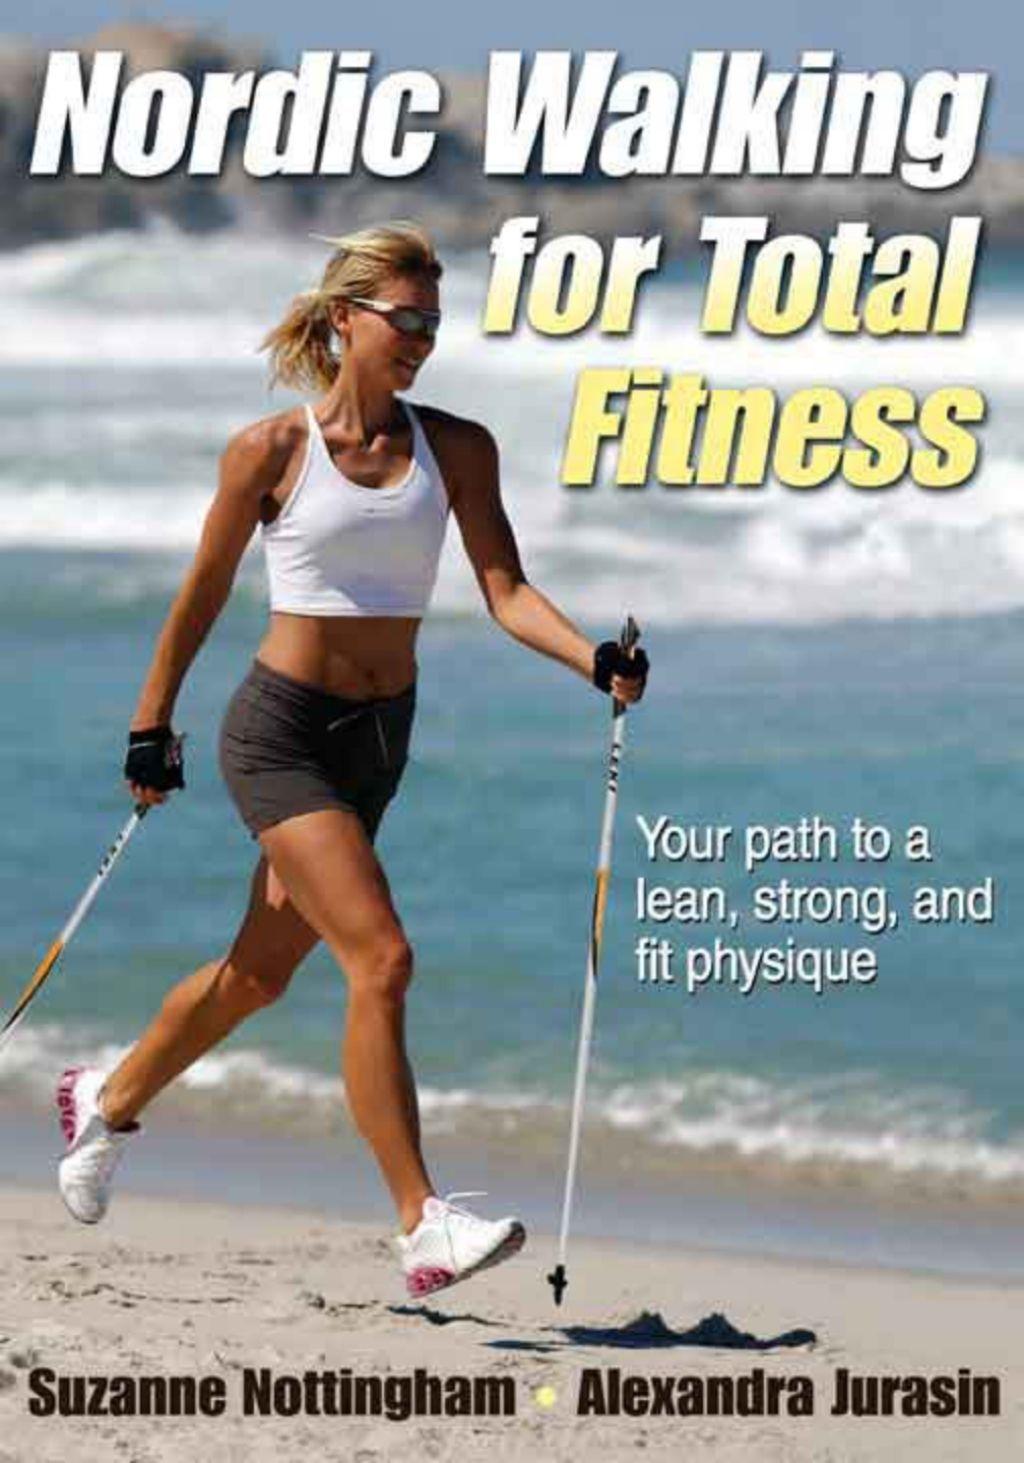 Nordic Walking für totale Fitness (eBook-Verleih) - Nordic Walking für totale Fitness (eBook-Verleih...